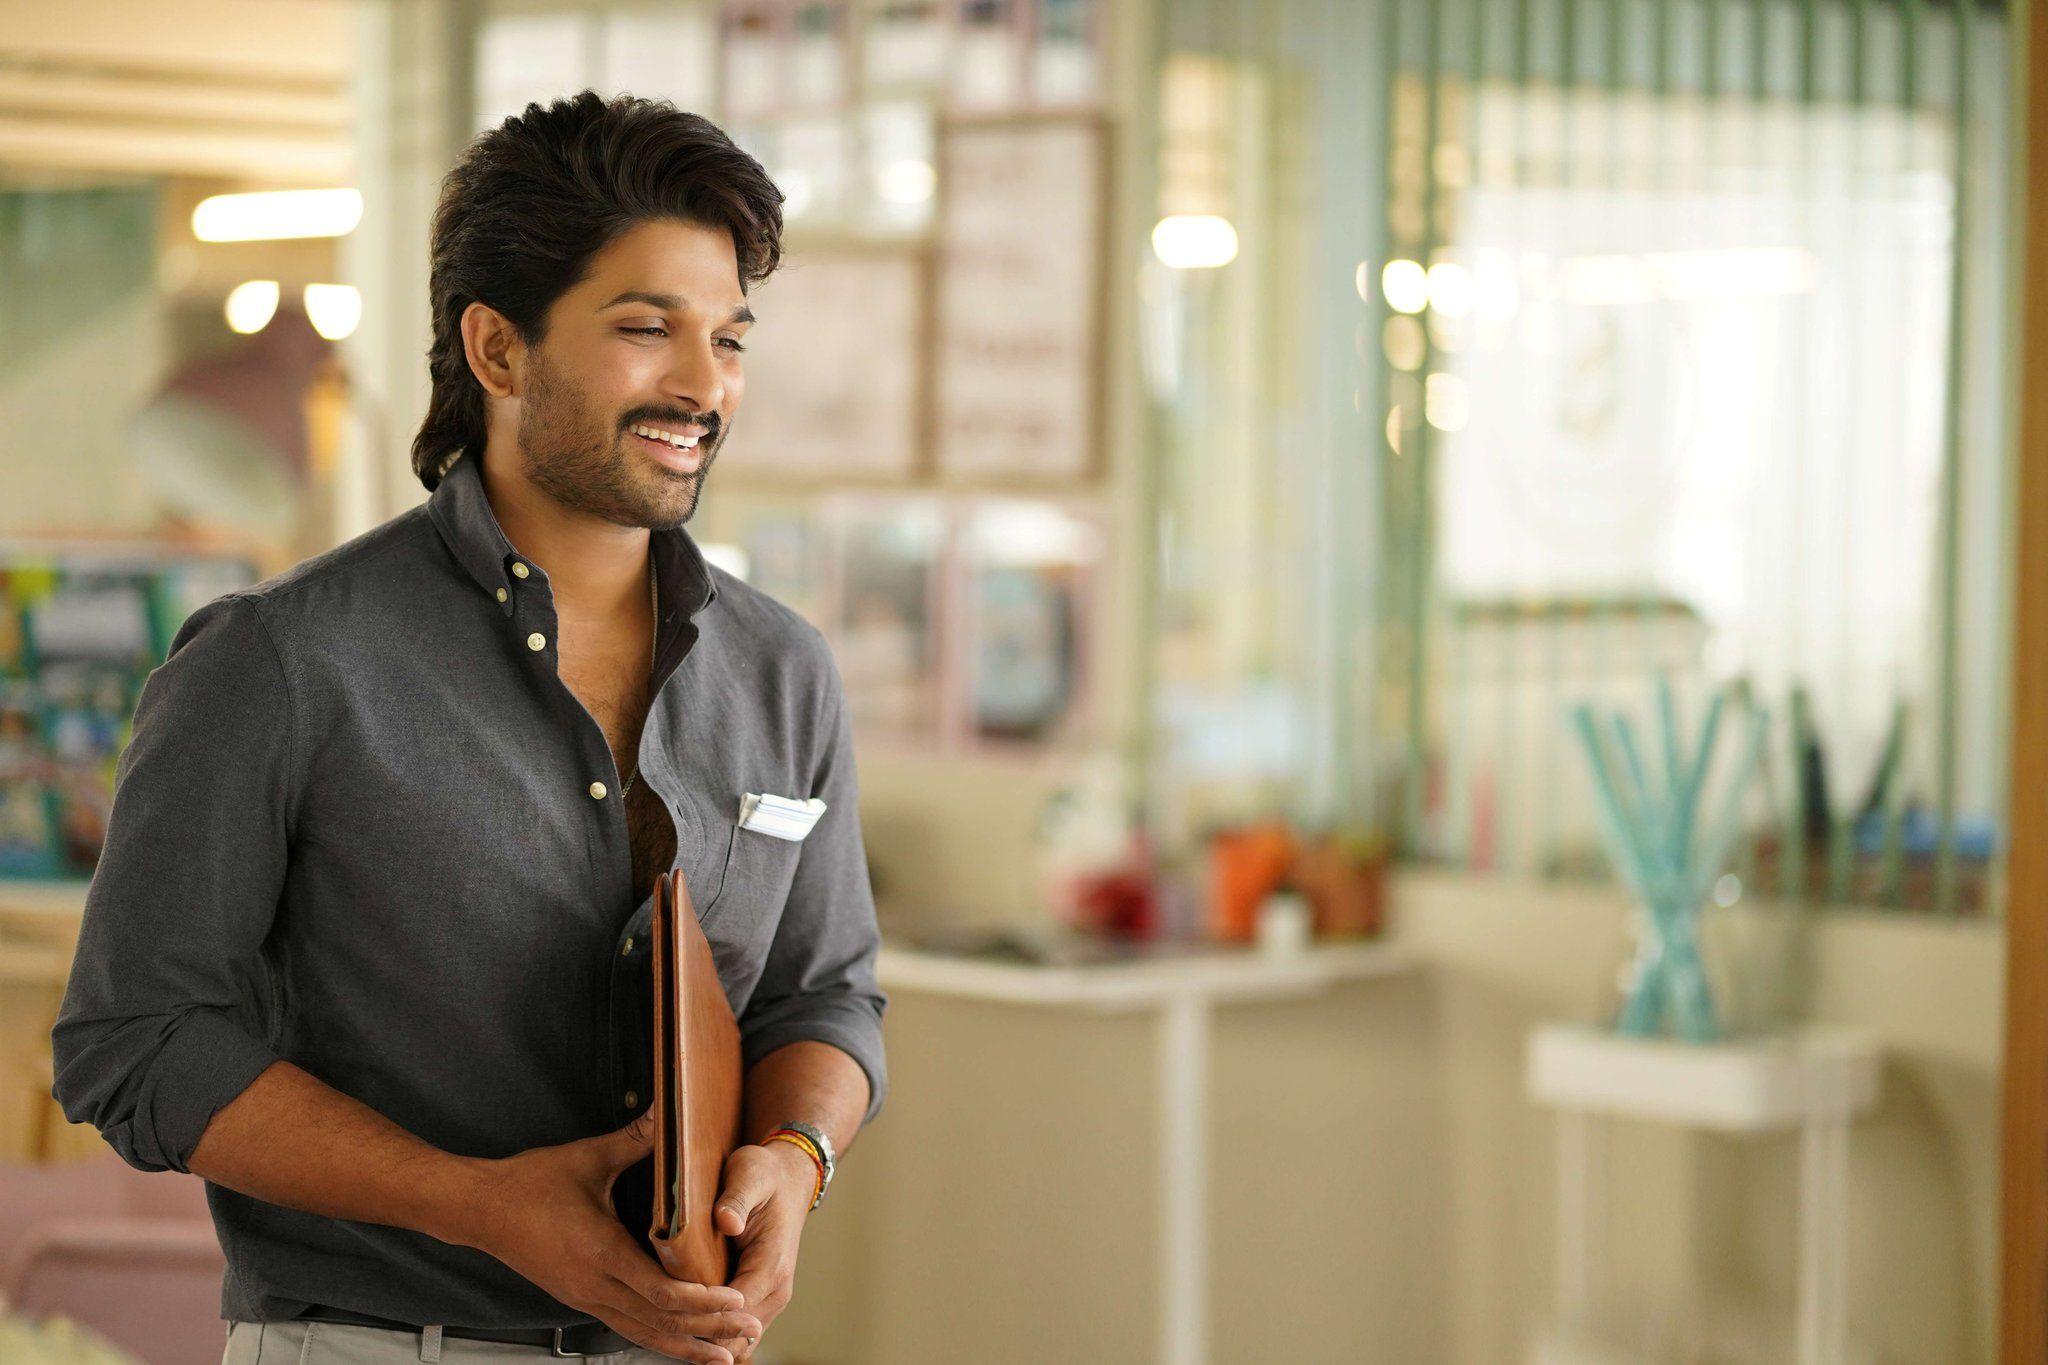 Stylish Star Allu Arjun Stills from Ala Vaikuntapuramulo ...